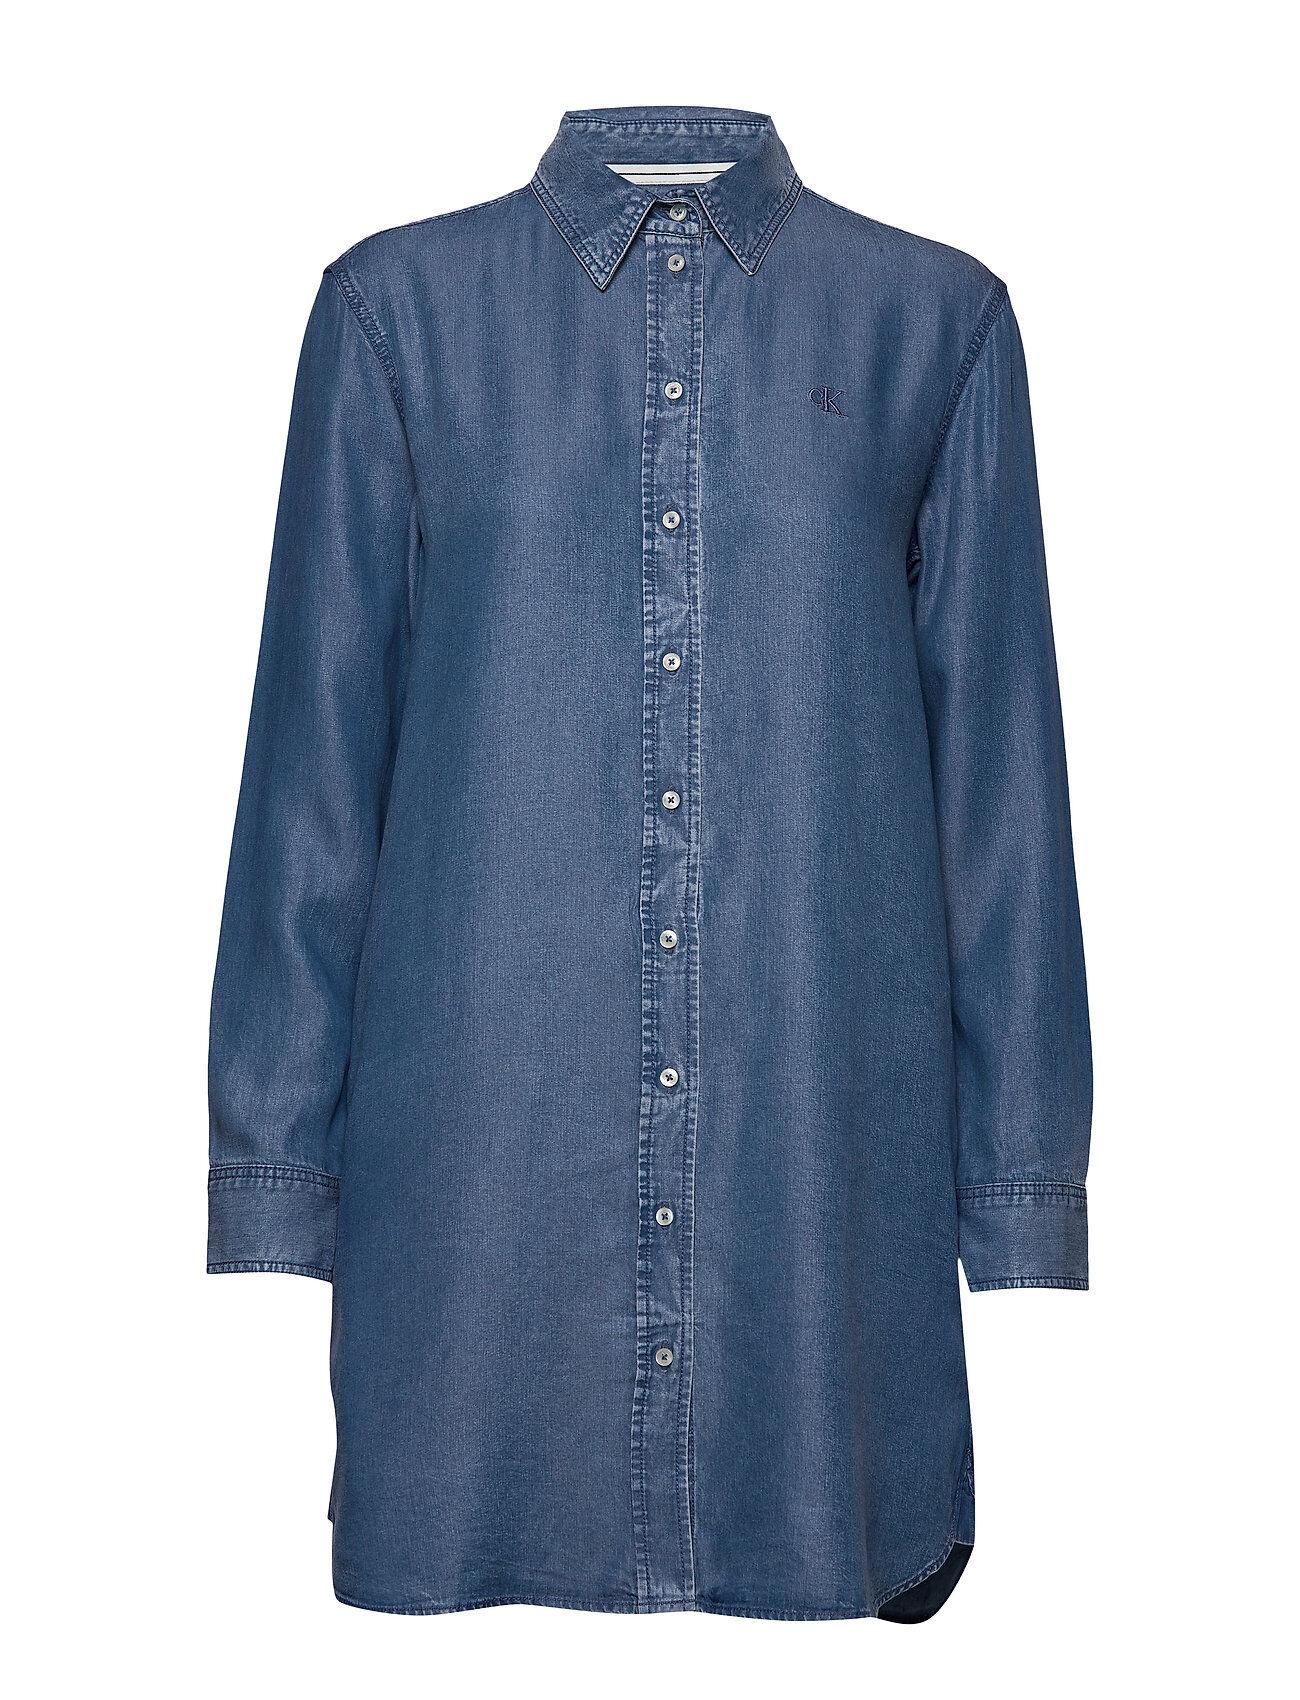 Image of Calvin Indigo Tencel Shirt Dress Lyhyt Mekko Sininen Calvin Klein Jeans